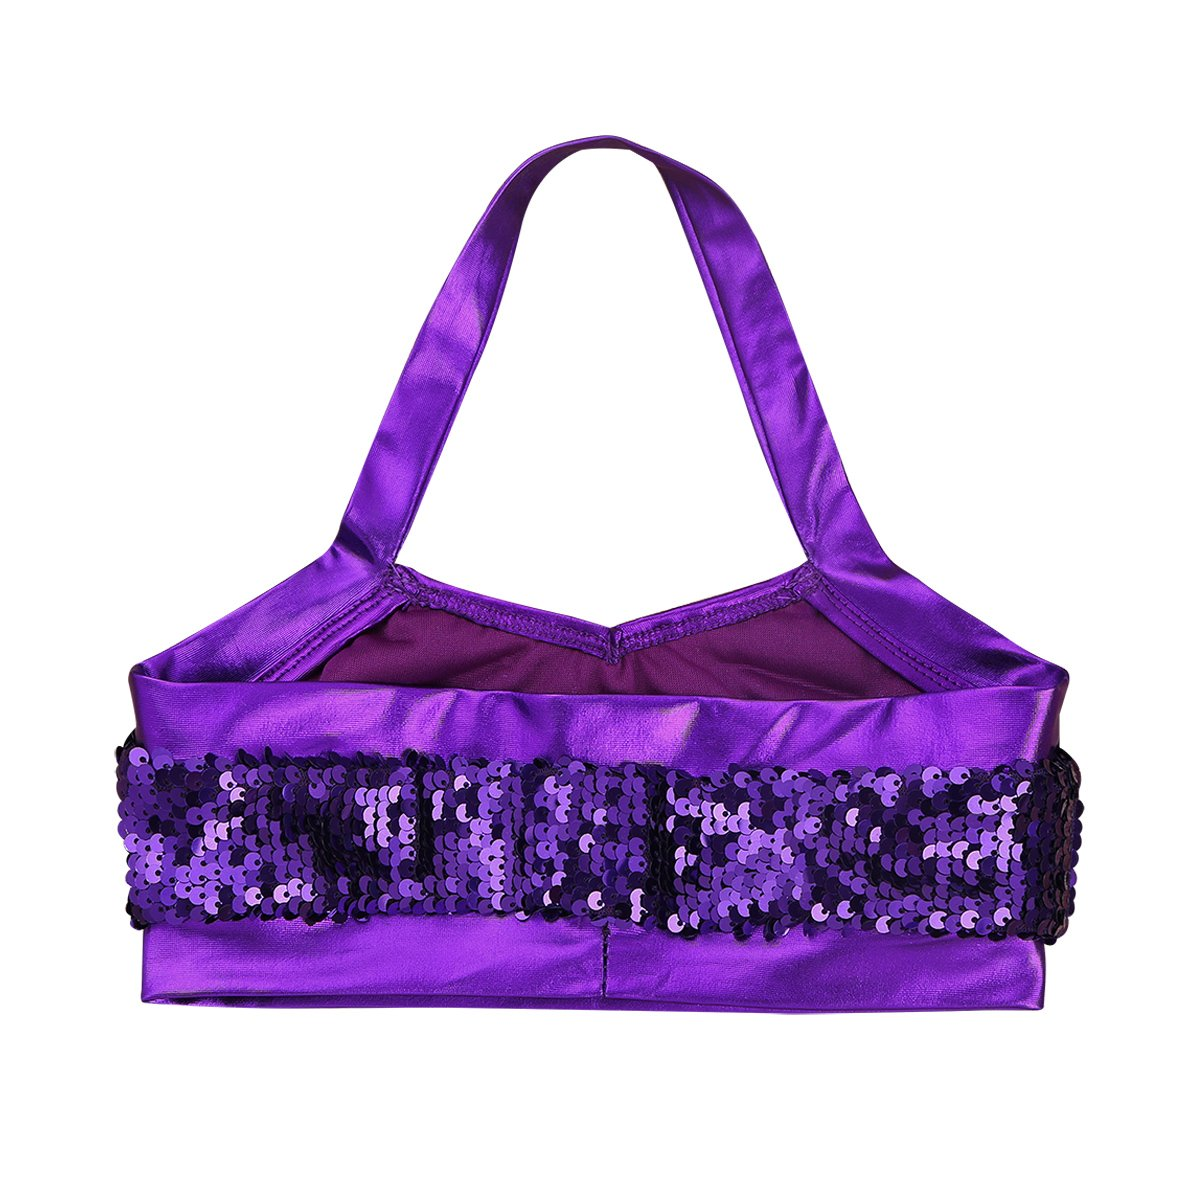 Freebily Girls Sequins Halter Crop Tops Camisole Tank Undershirt Dance Top Sport Bra Stage Performance Party Costume